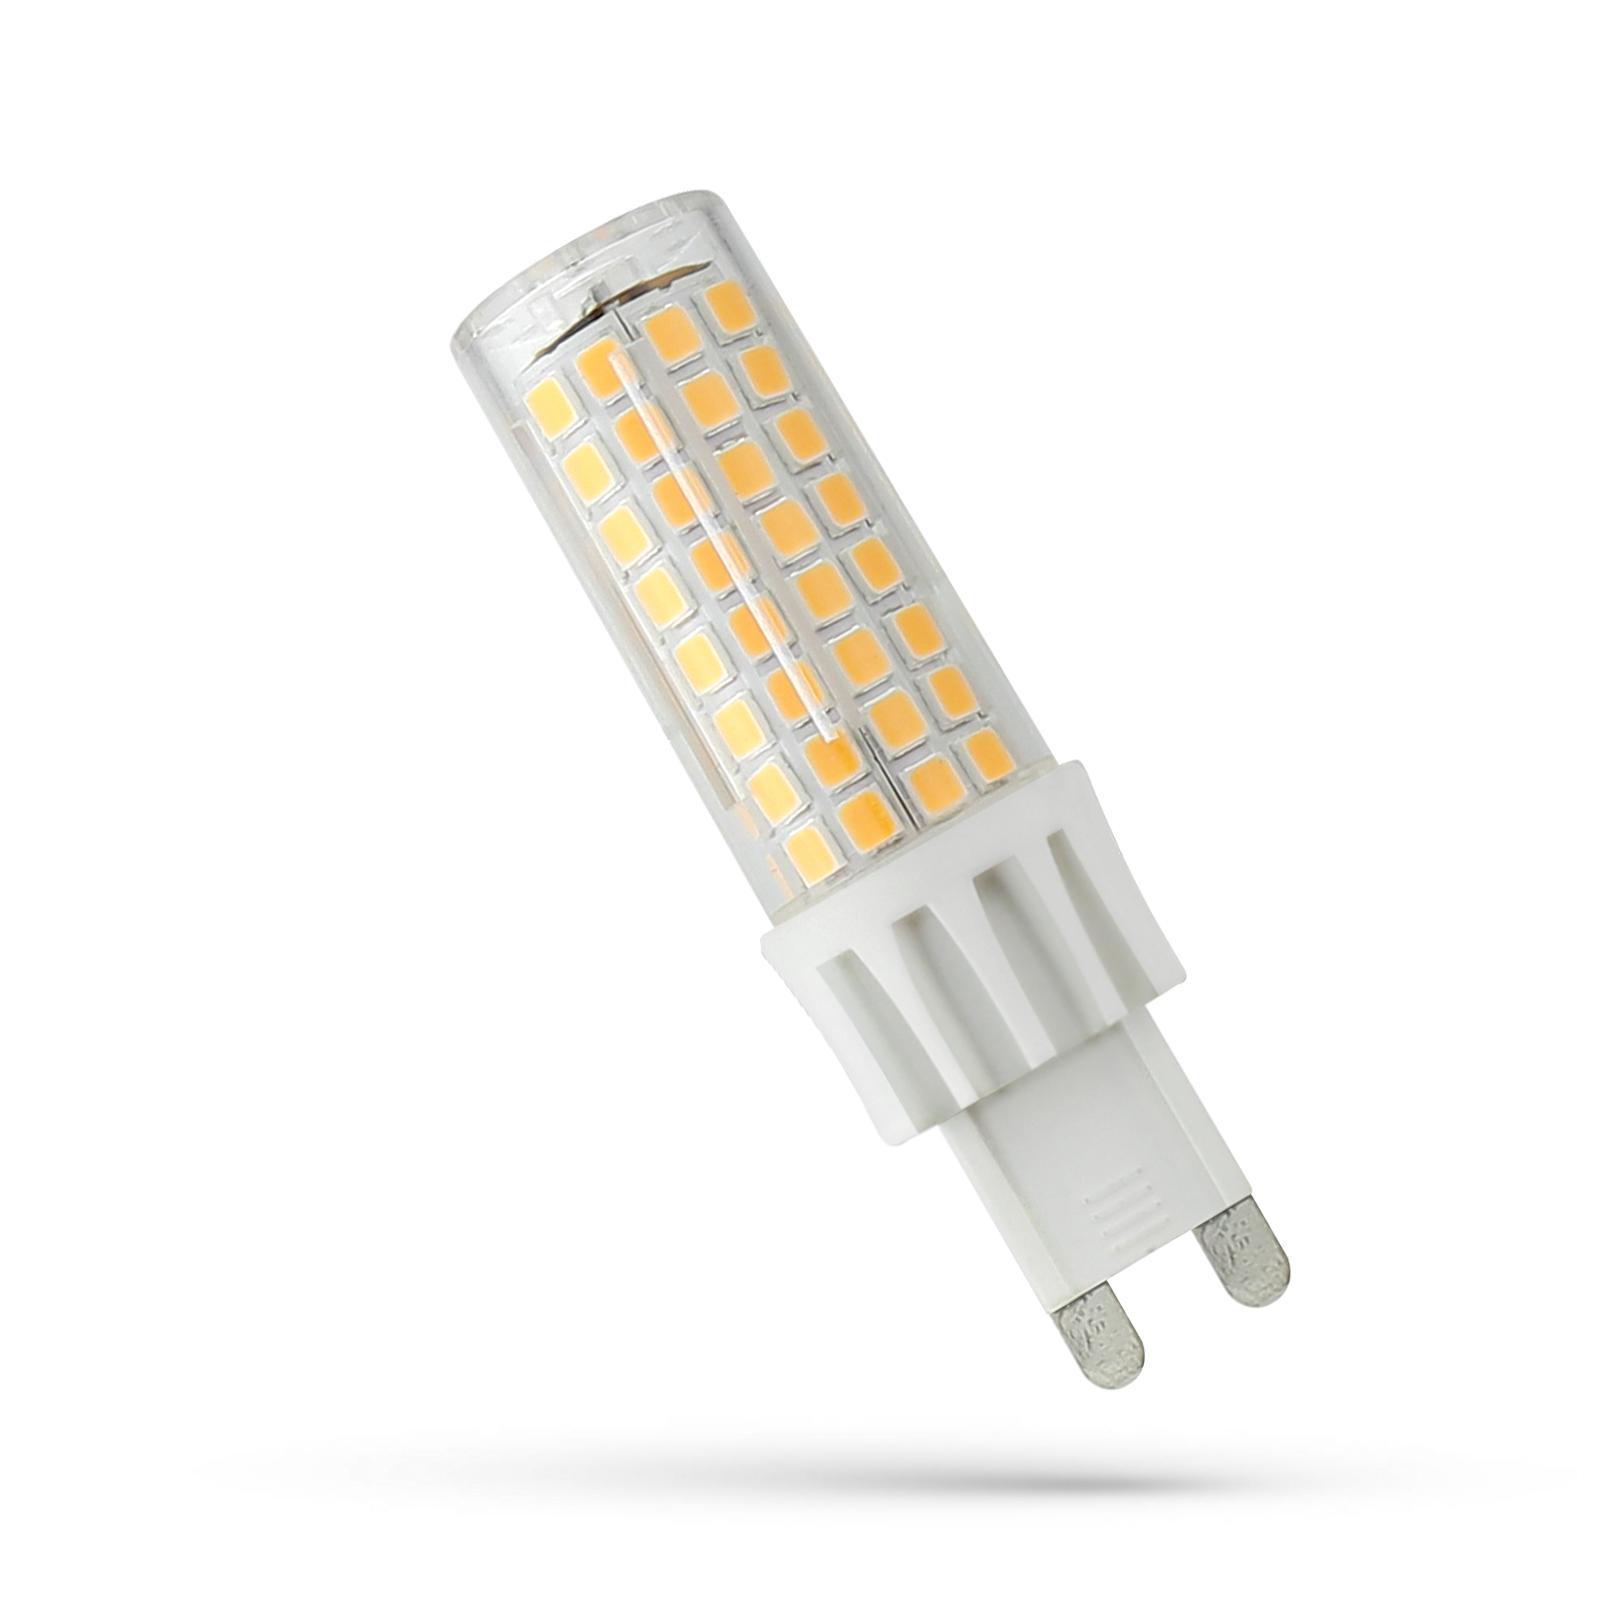 LED G9 230V 7W CW SMD SPECTRUM